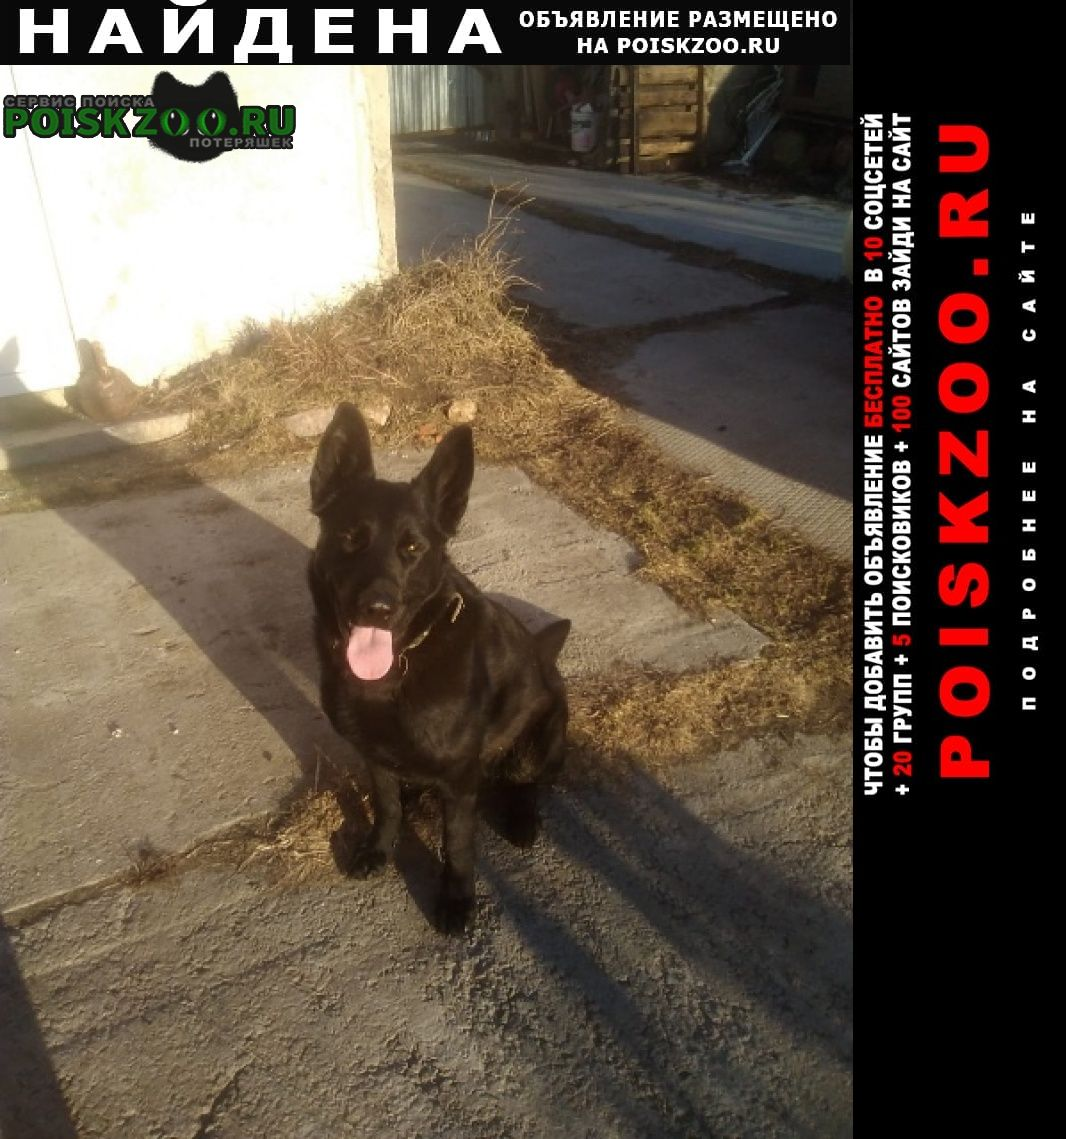 Найдена собака кобель чёрная овчарка в химках Химки